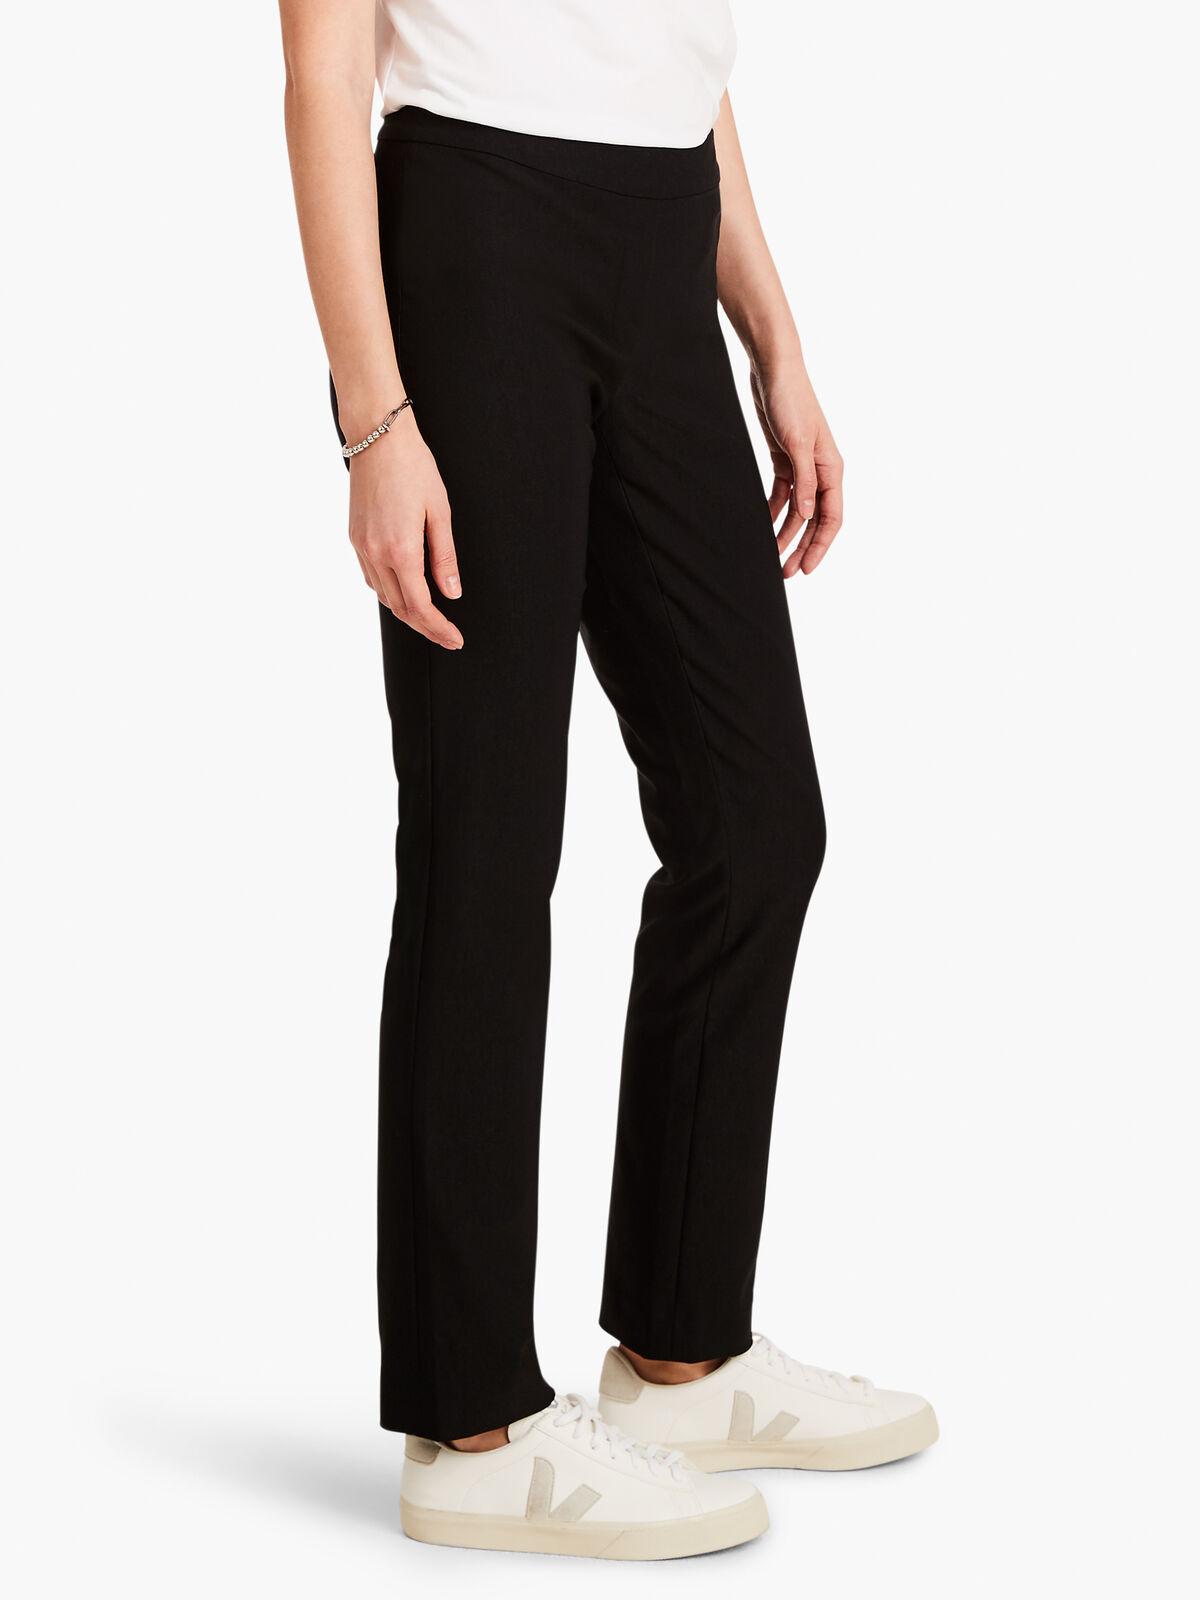 Wonderstretch Trouser Pant